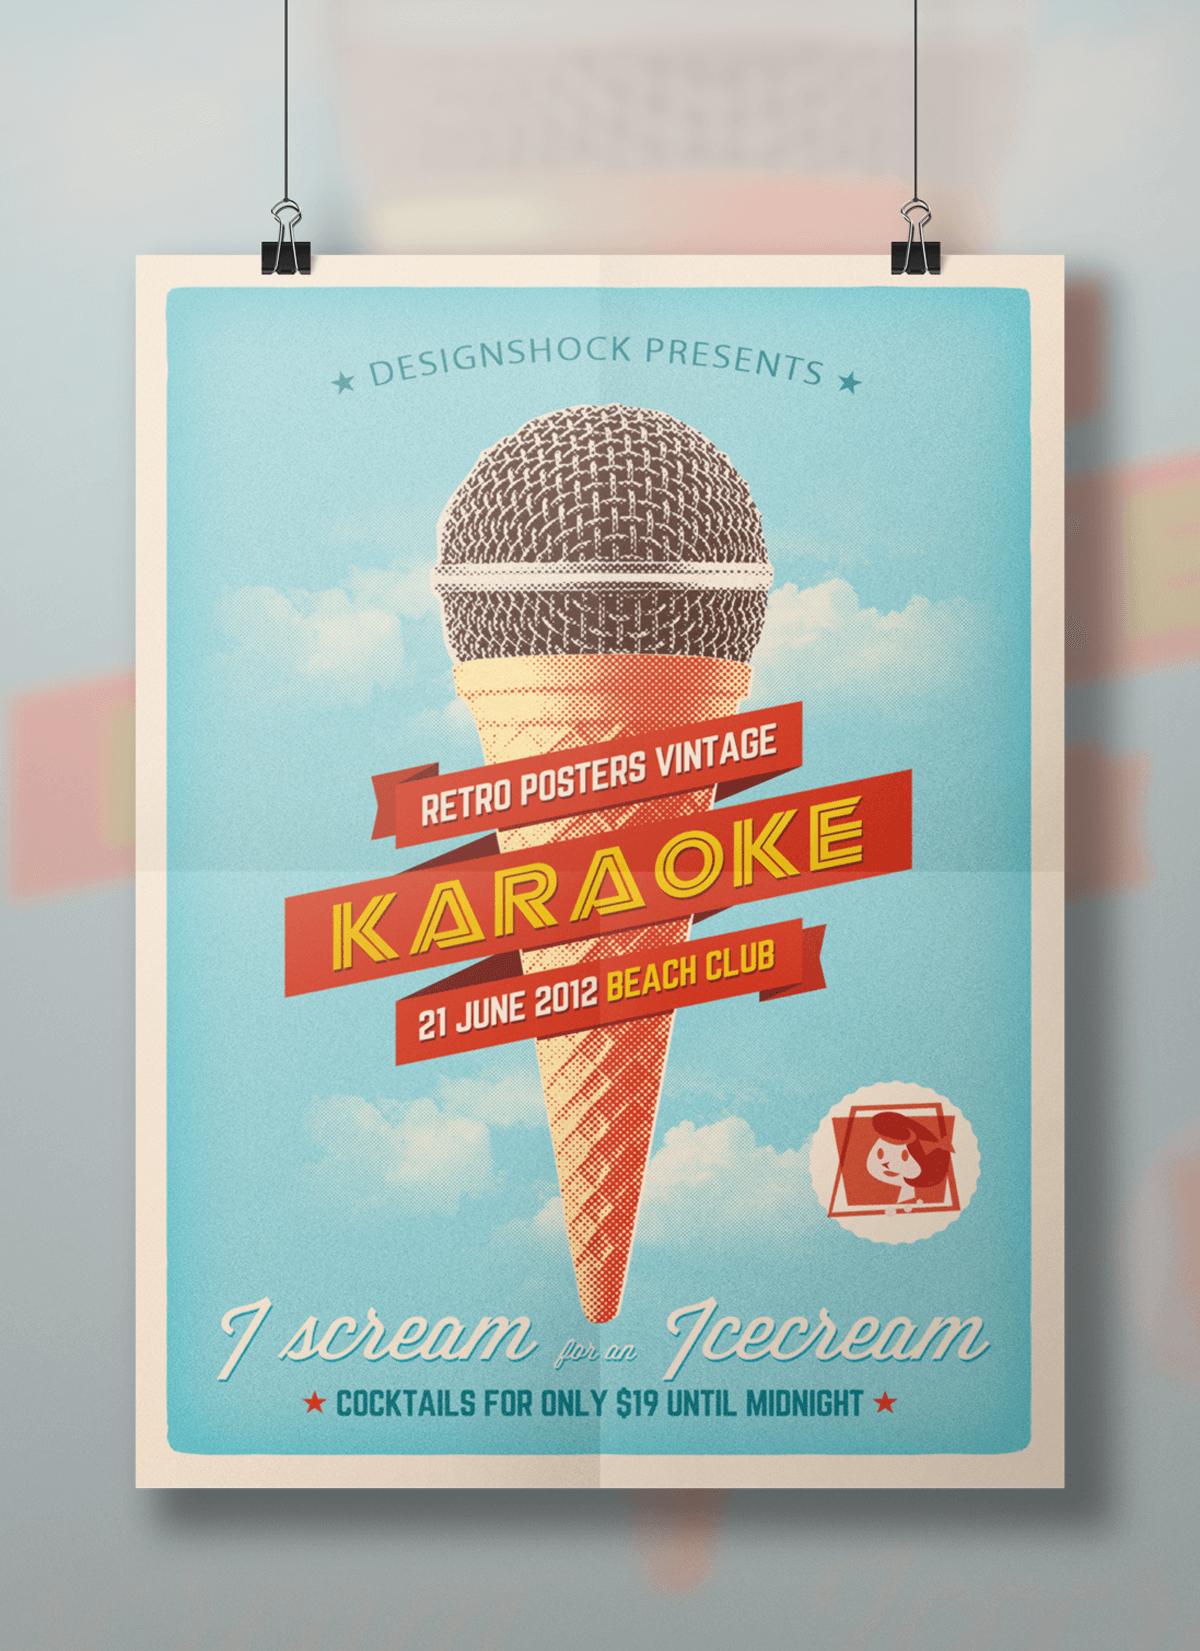 poster-vintage-karaoke-beach